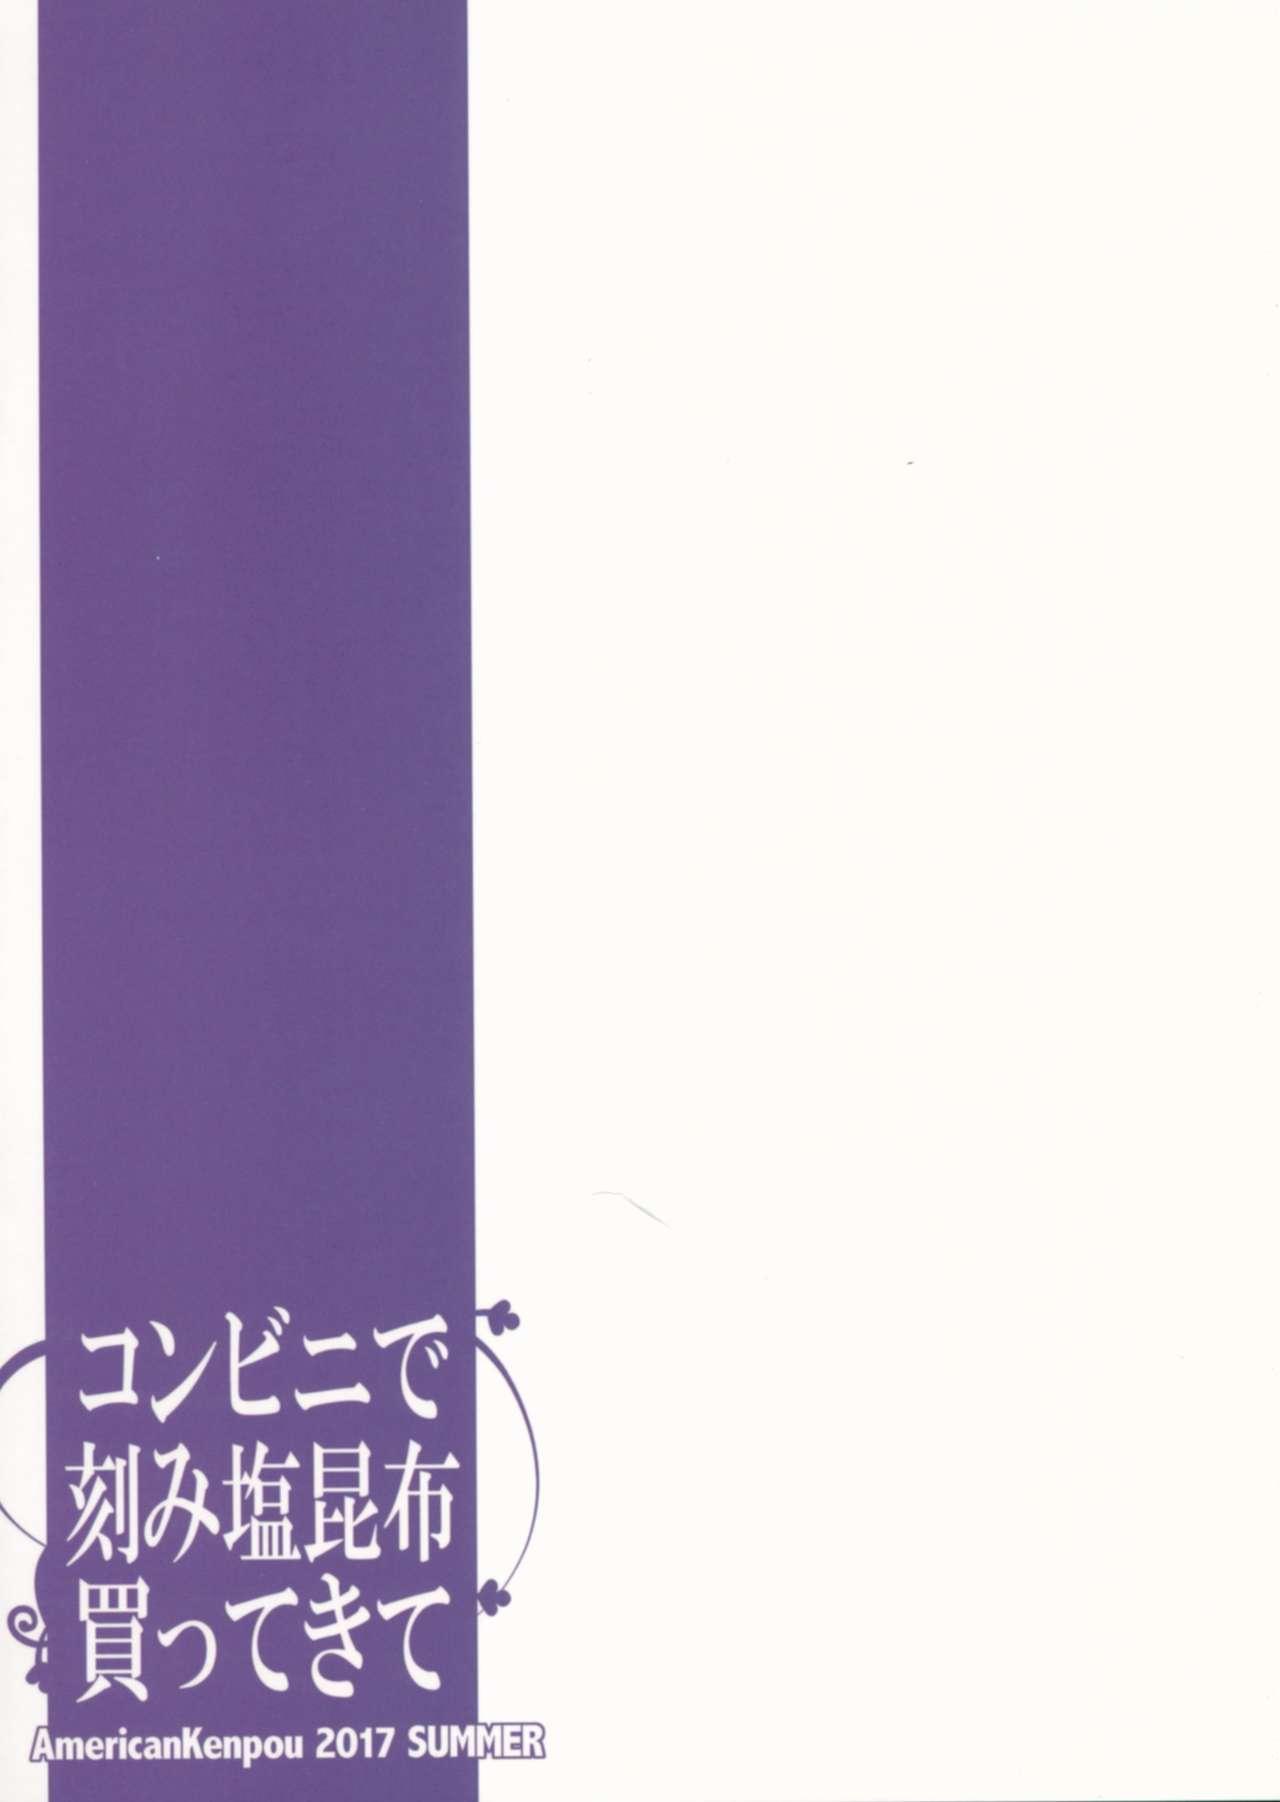 Conveni de Kizami Shiokonbu Kattekite 37